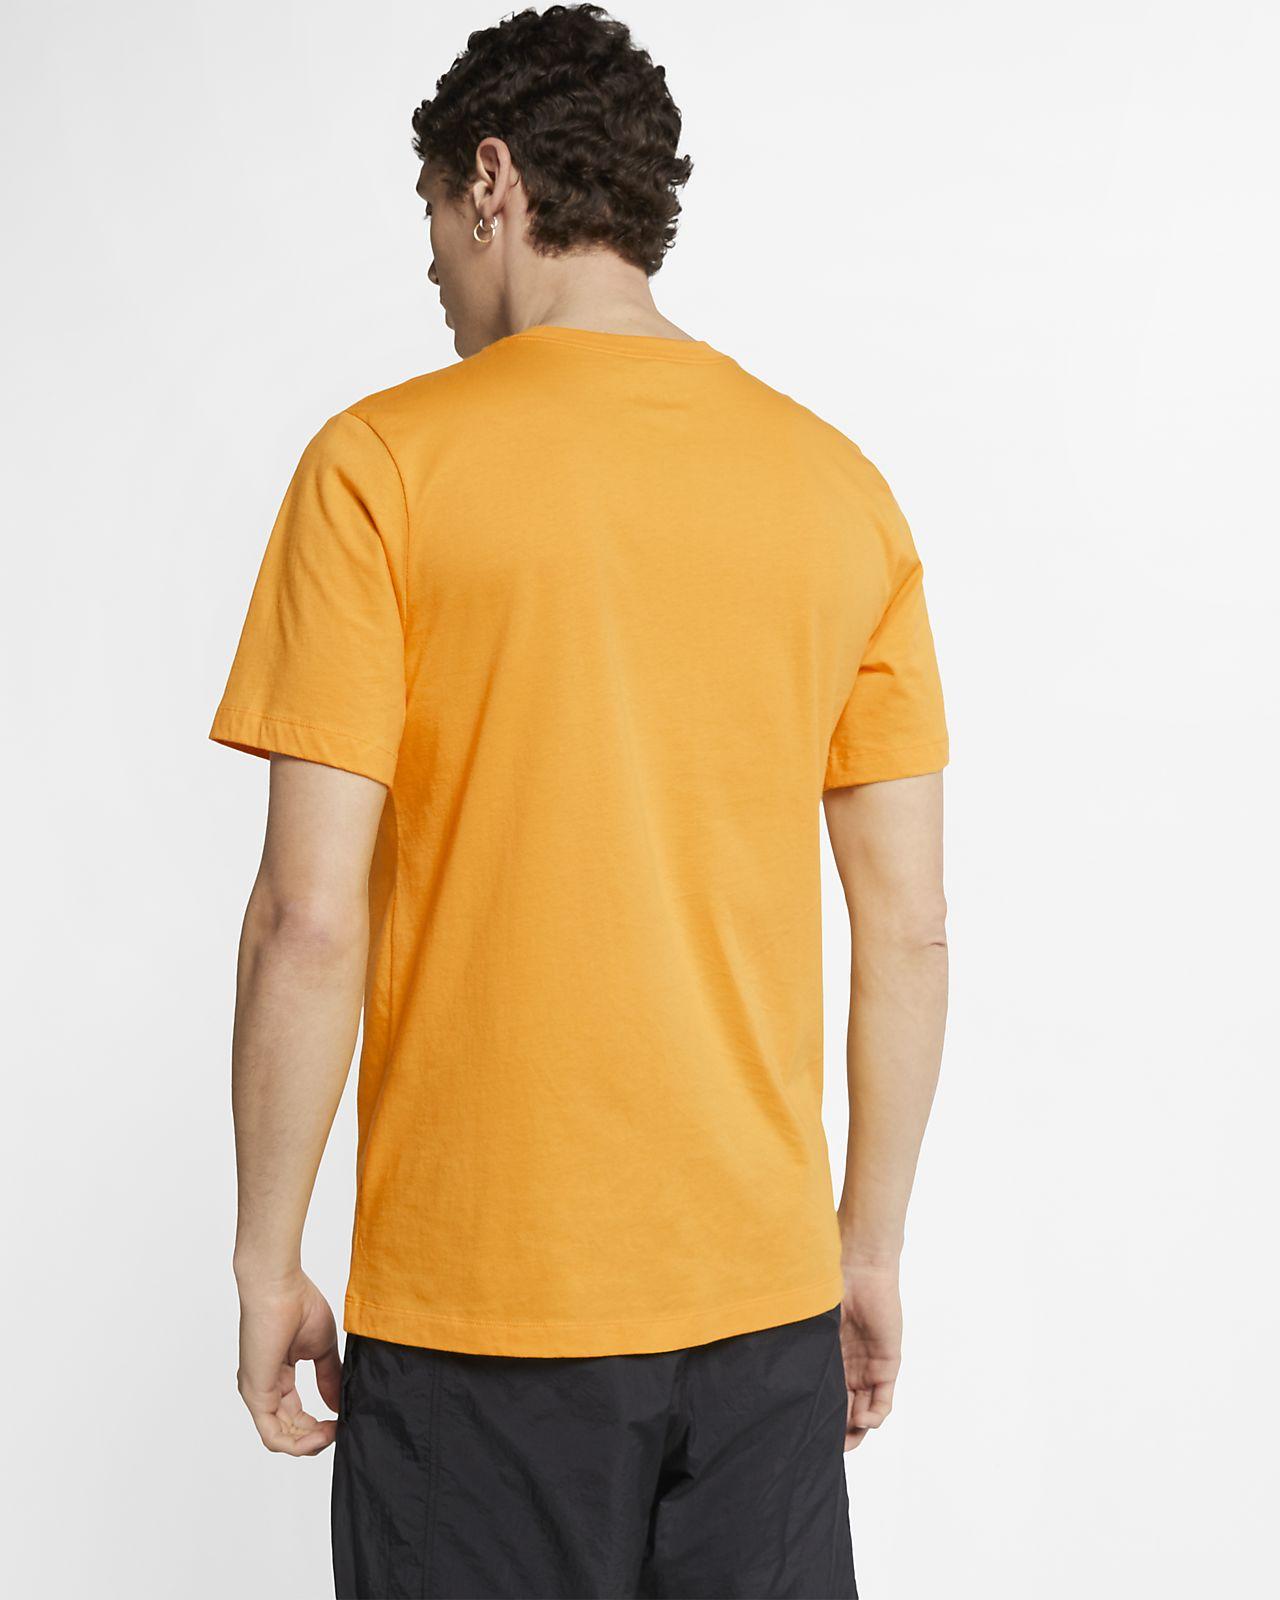 7b3a226657e0 Low Resolution Pánské tričko Jordan Poolside Pánské tričko Jordan Poolside